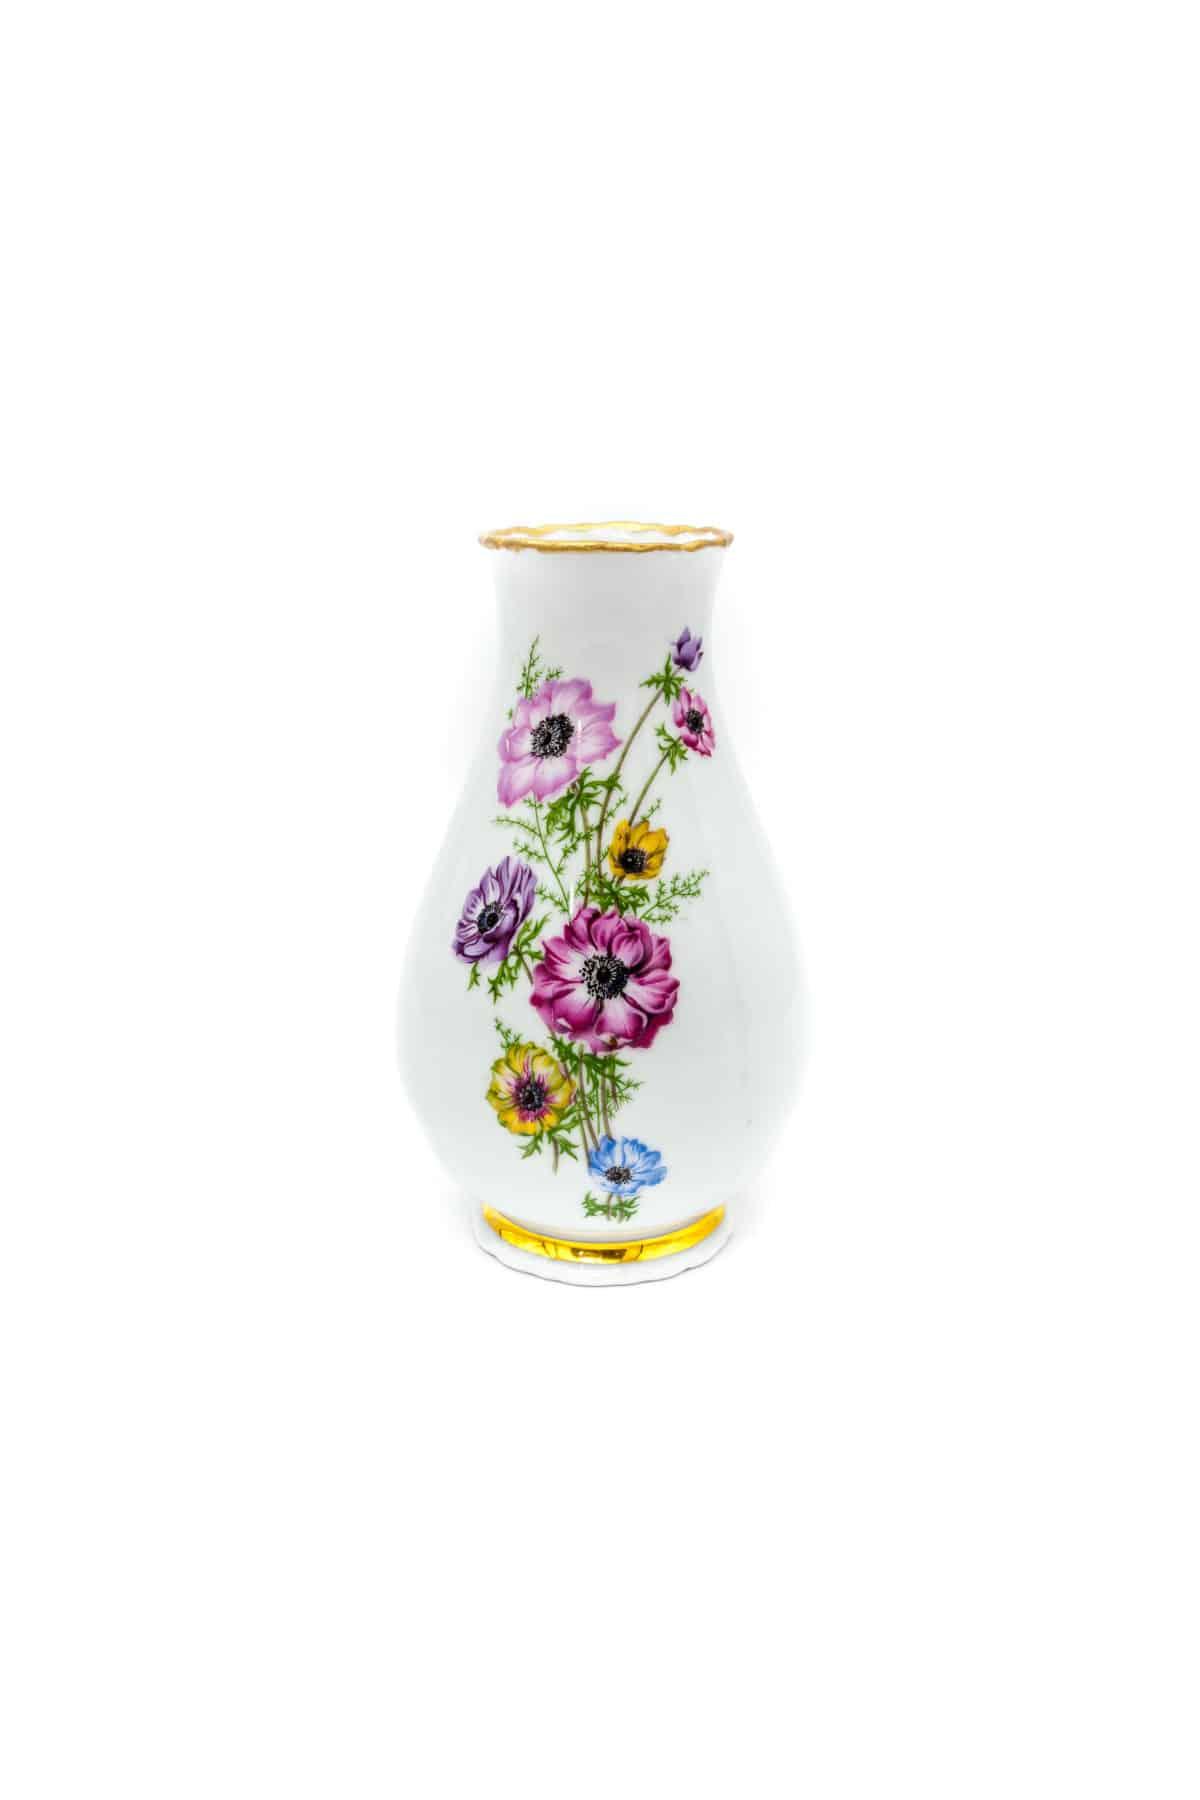 farforovaya vaza s tsvetami